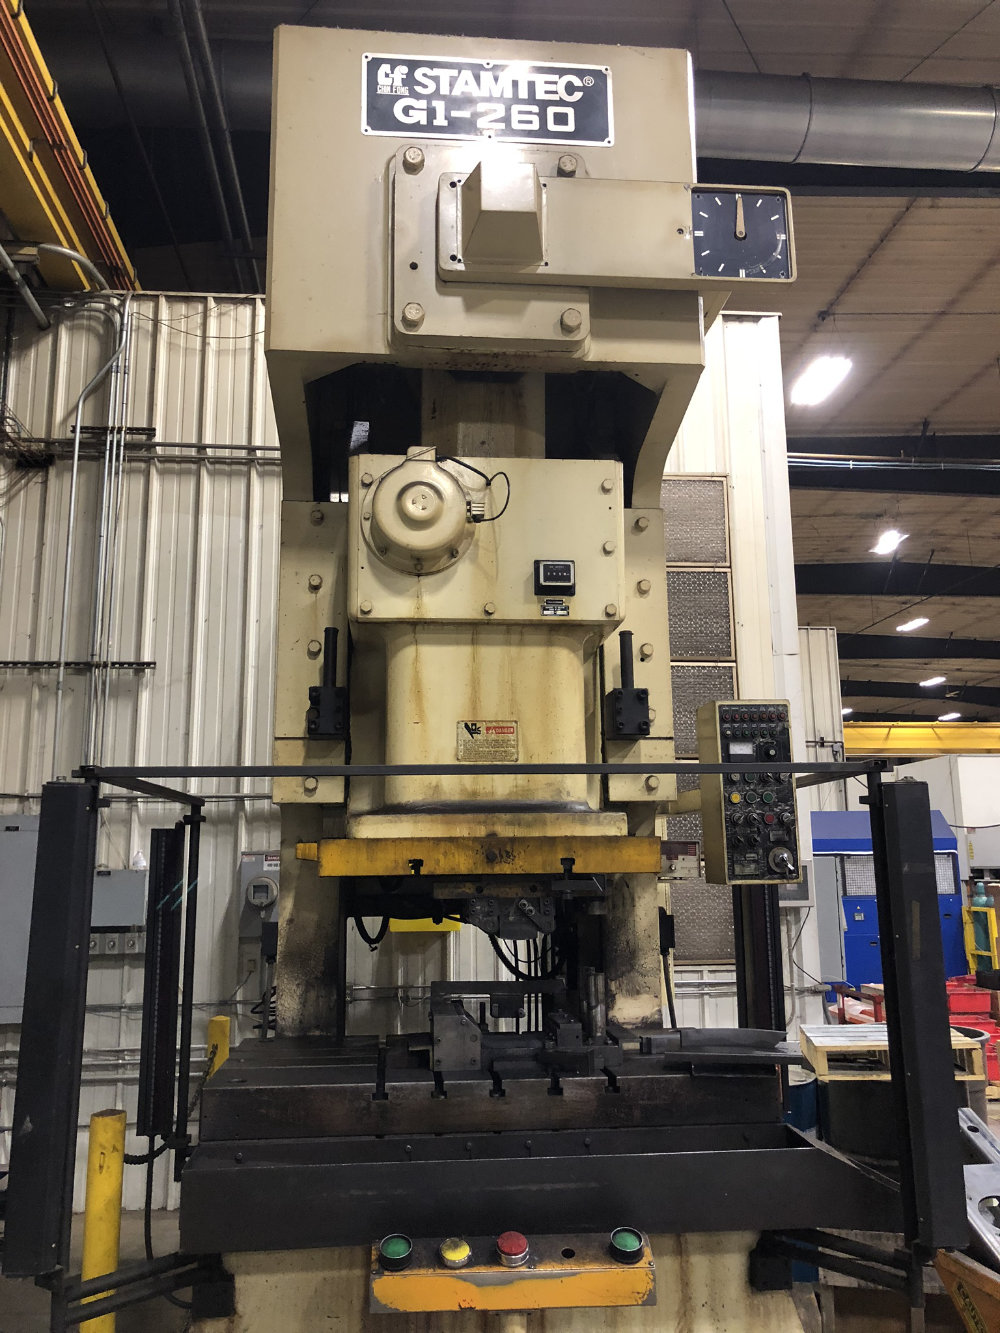 "Stamtec G1-260 Gap Frame Press, 286 Tons, 20-40 SPM, 59"" x 33"" Bed, Air Clutch / Brake - Image 3 of 9"